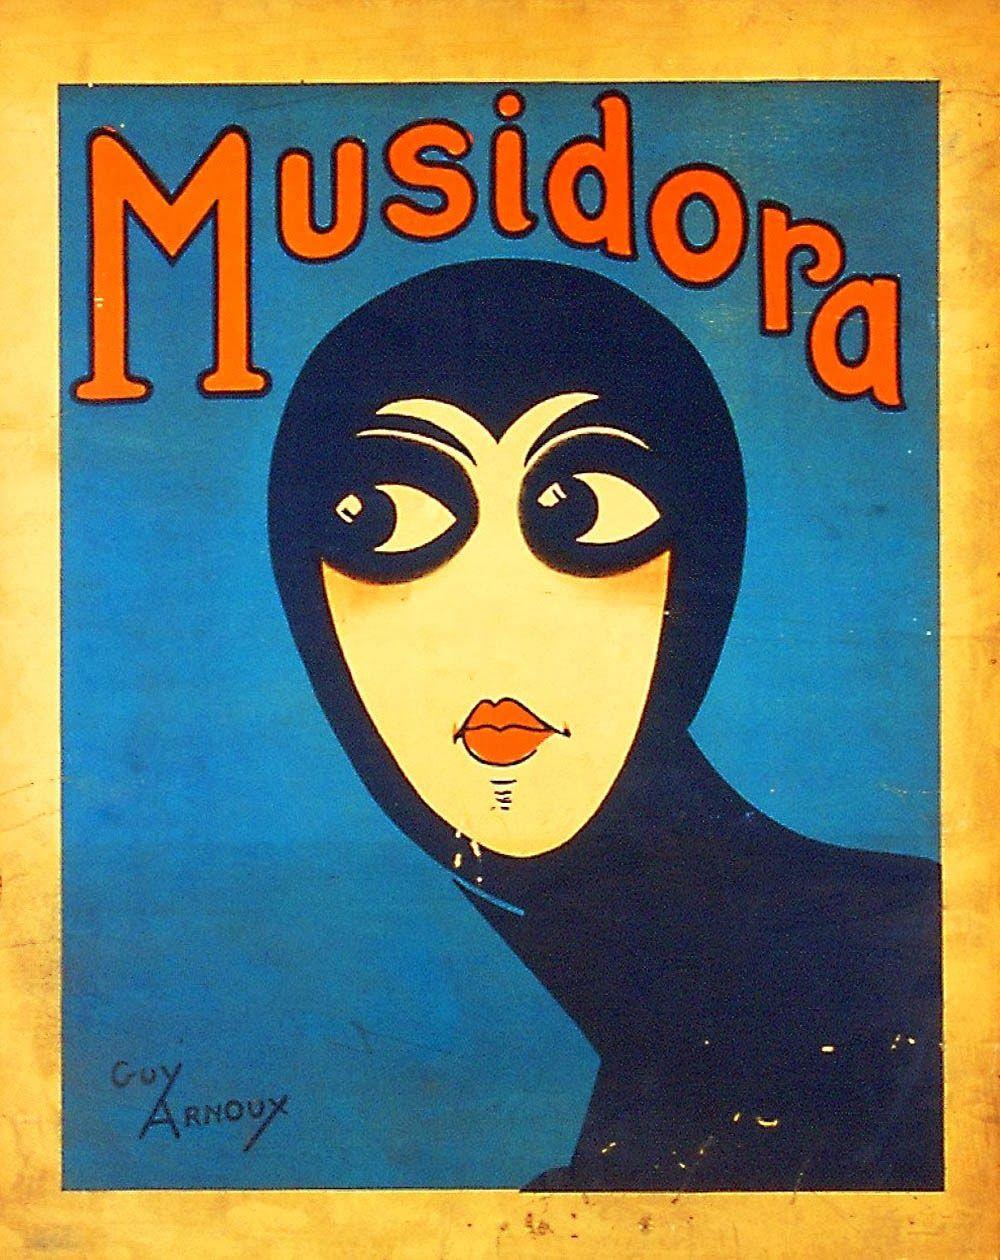 Guy Arnoux, Les vampires poster of Musidora as Irma Vep, 1915